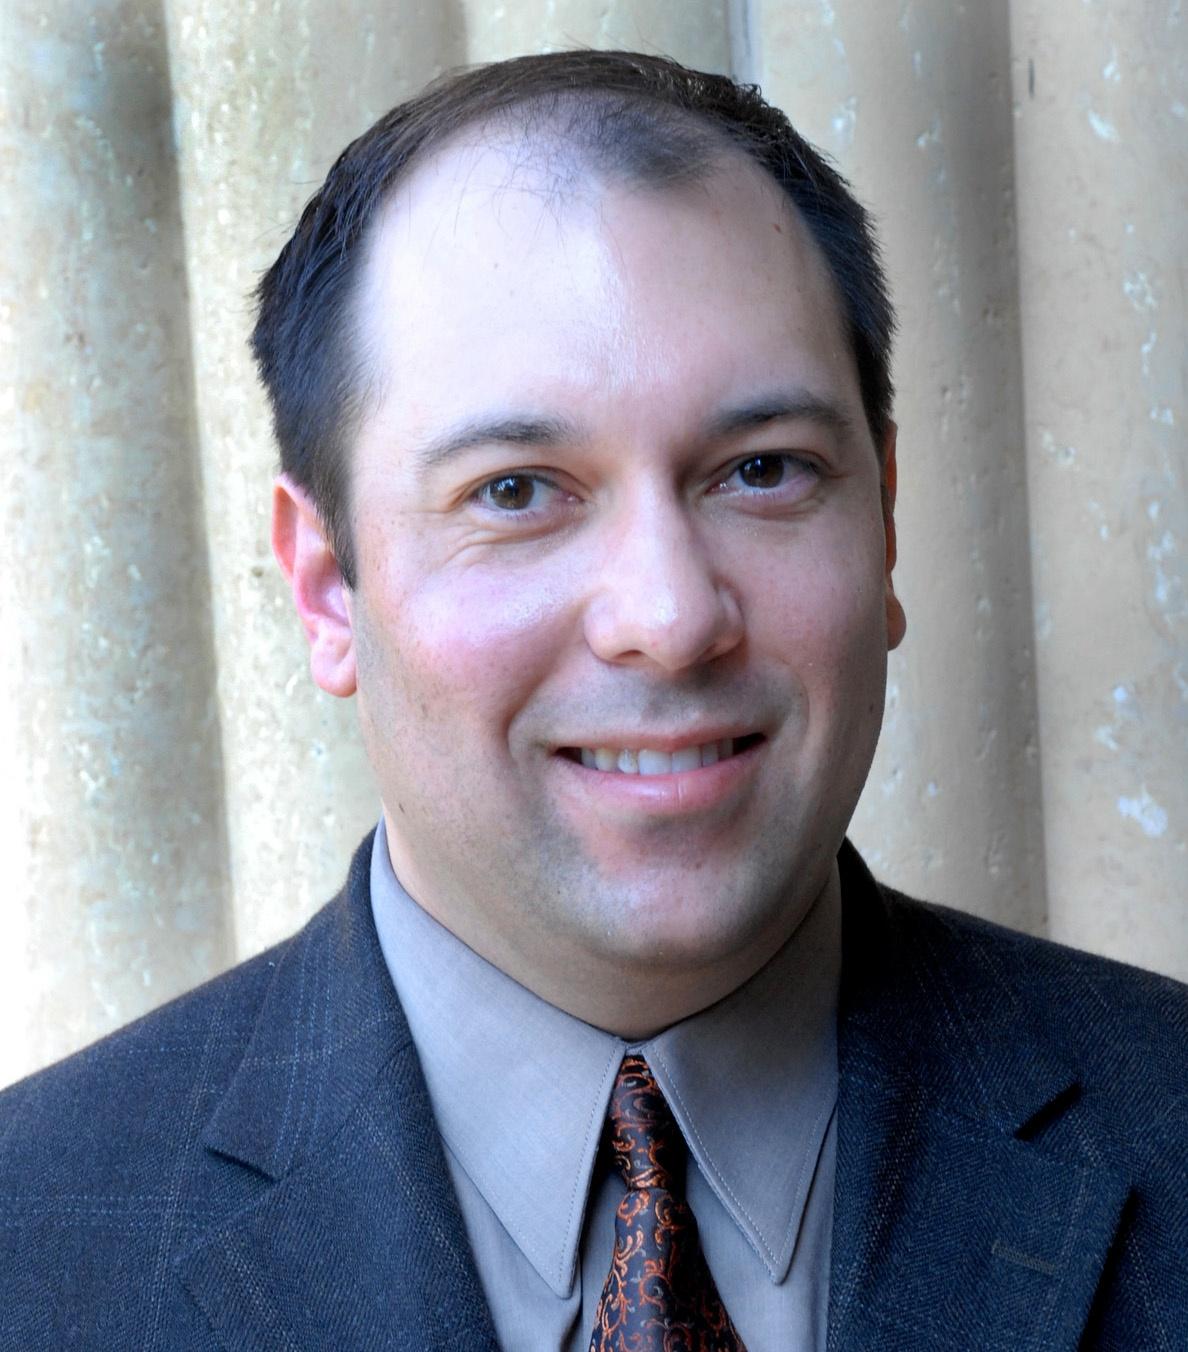 Nate Brisher